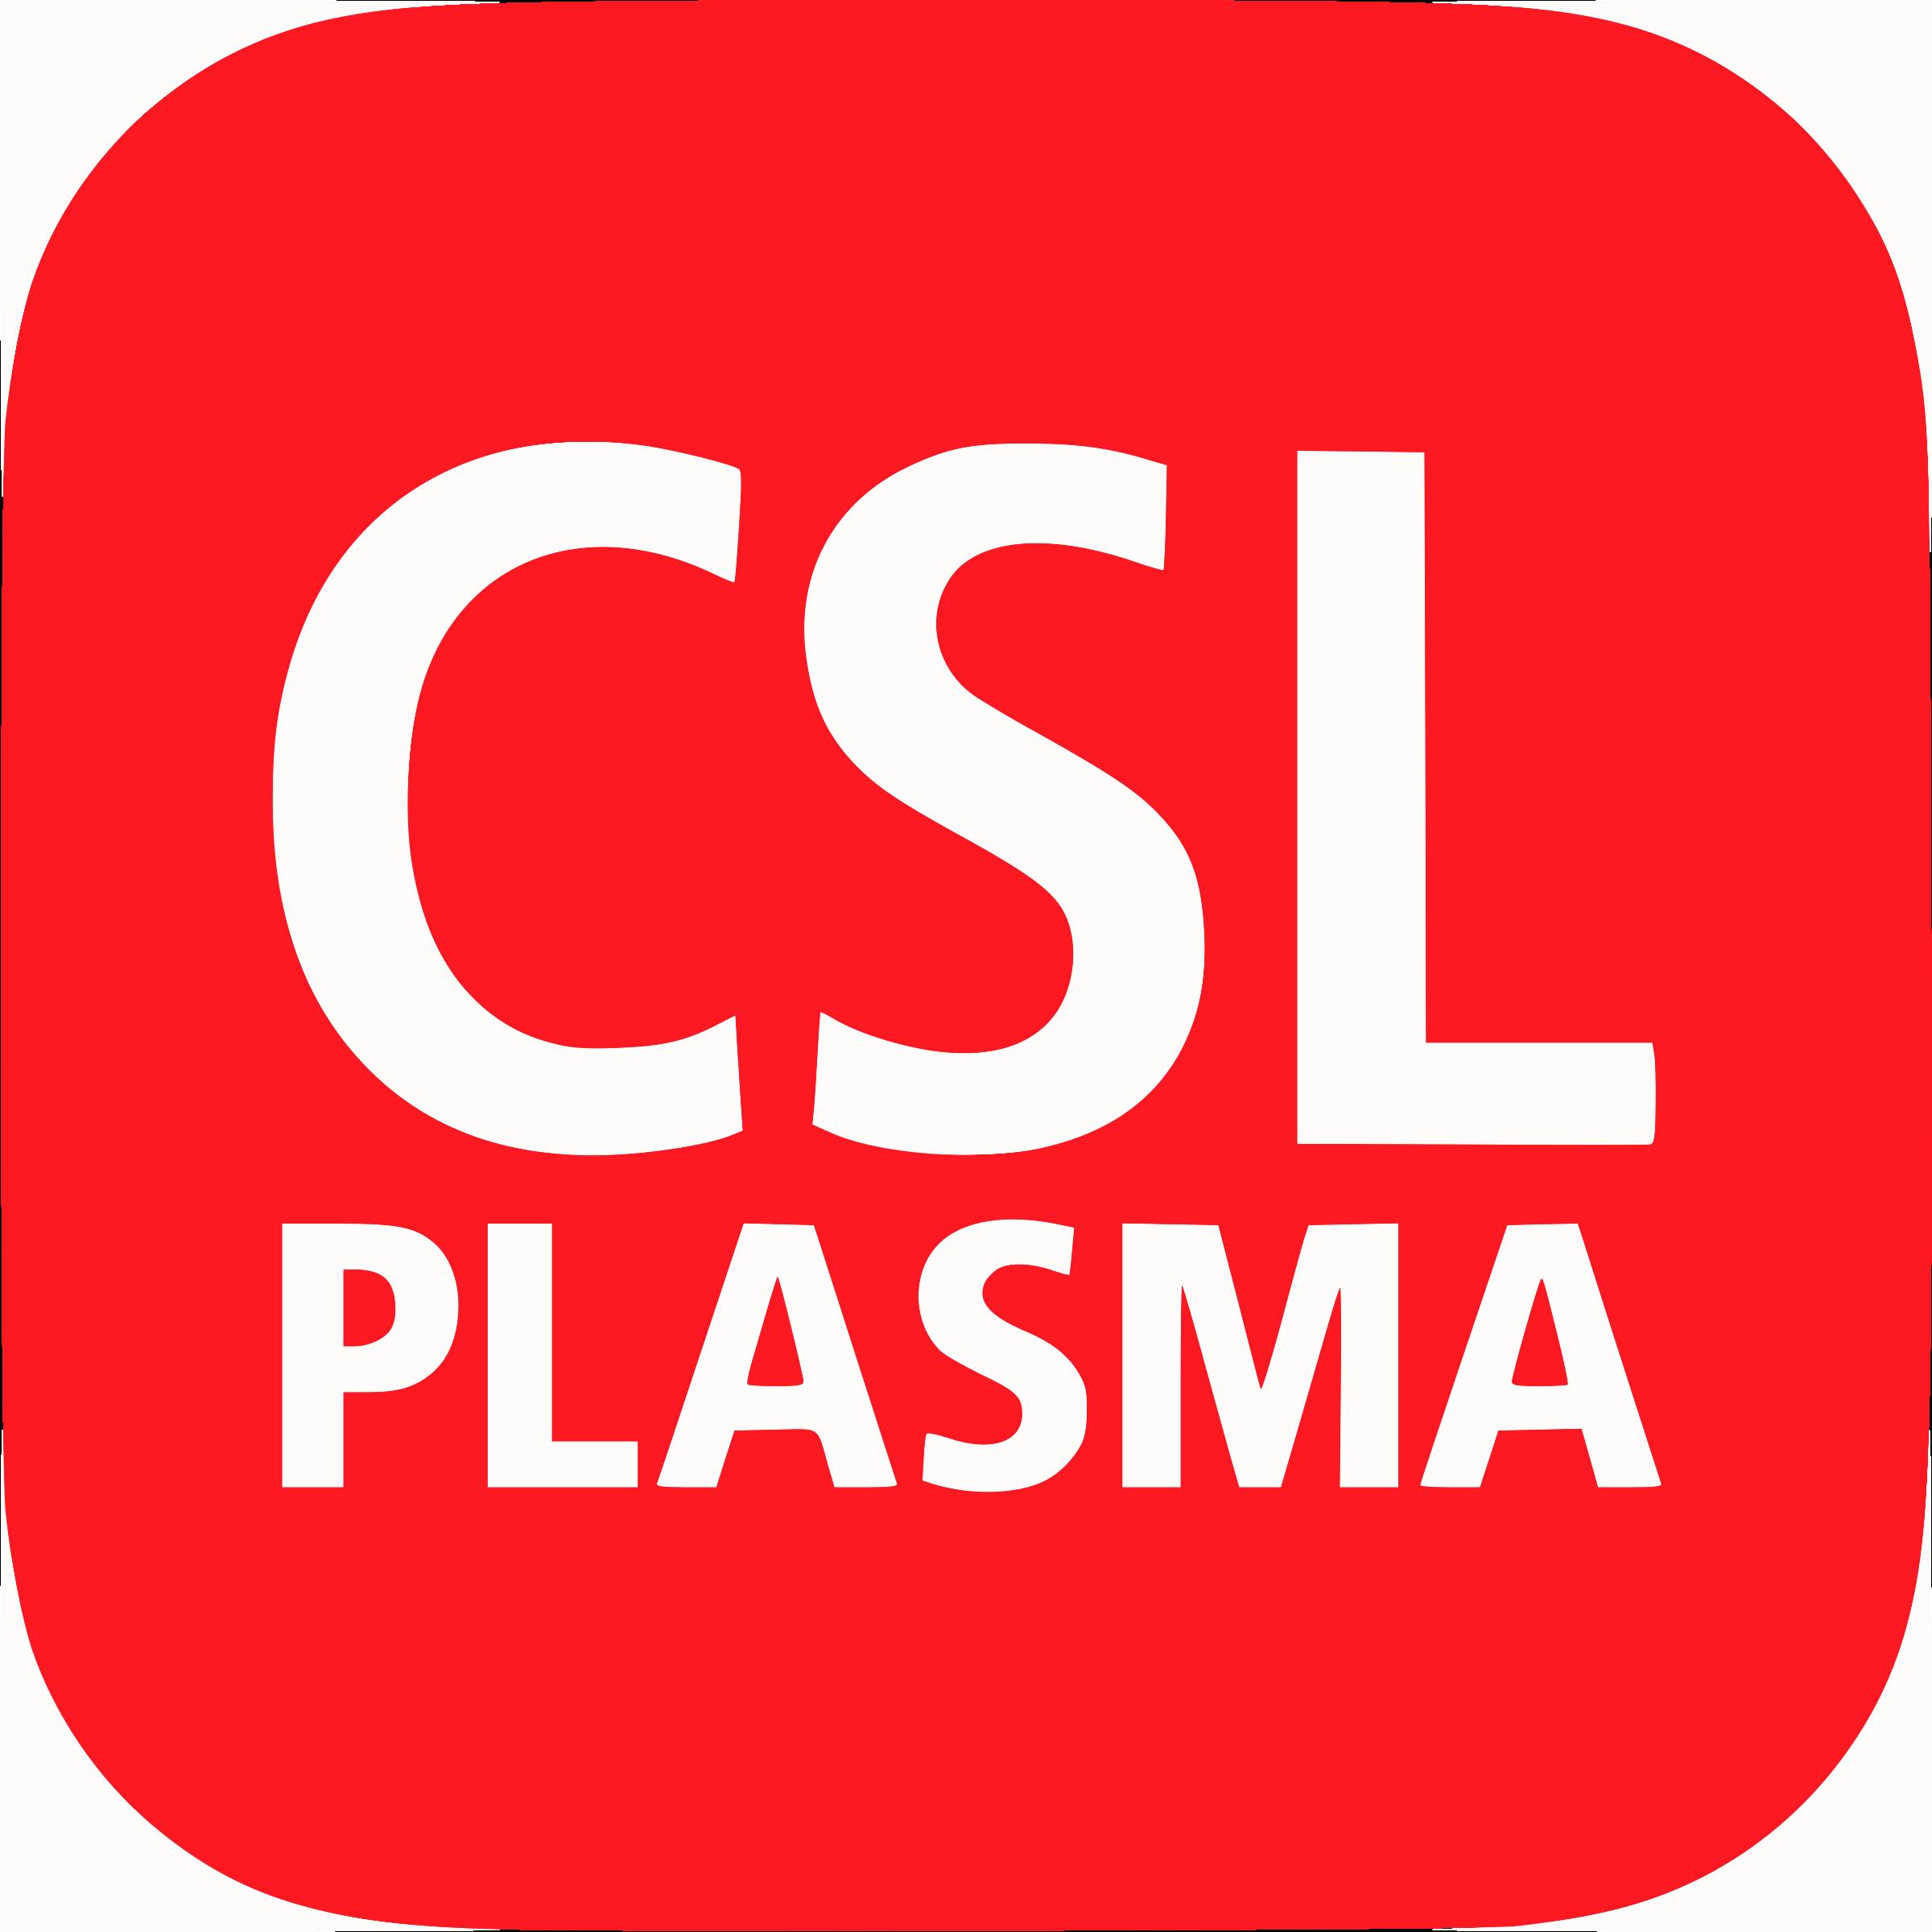 CSL Plasma Logo PNG Transparent & SVG Vector - Freebie Supply